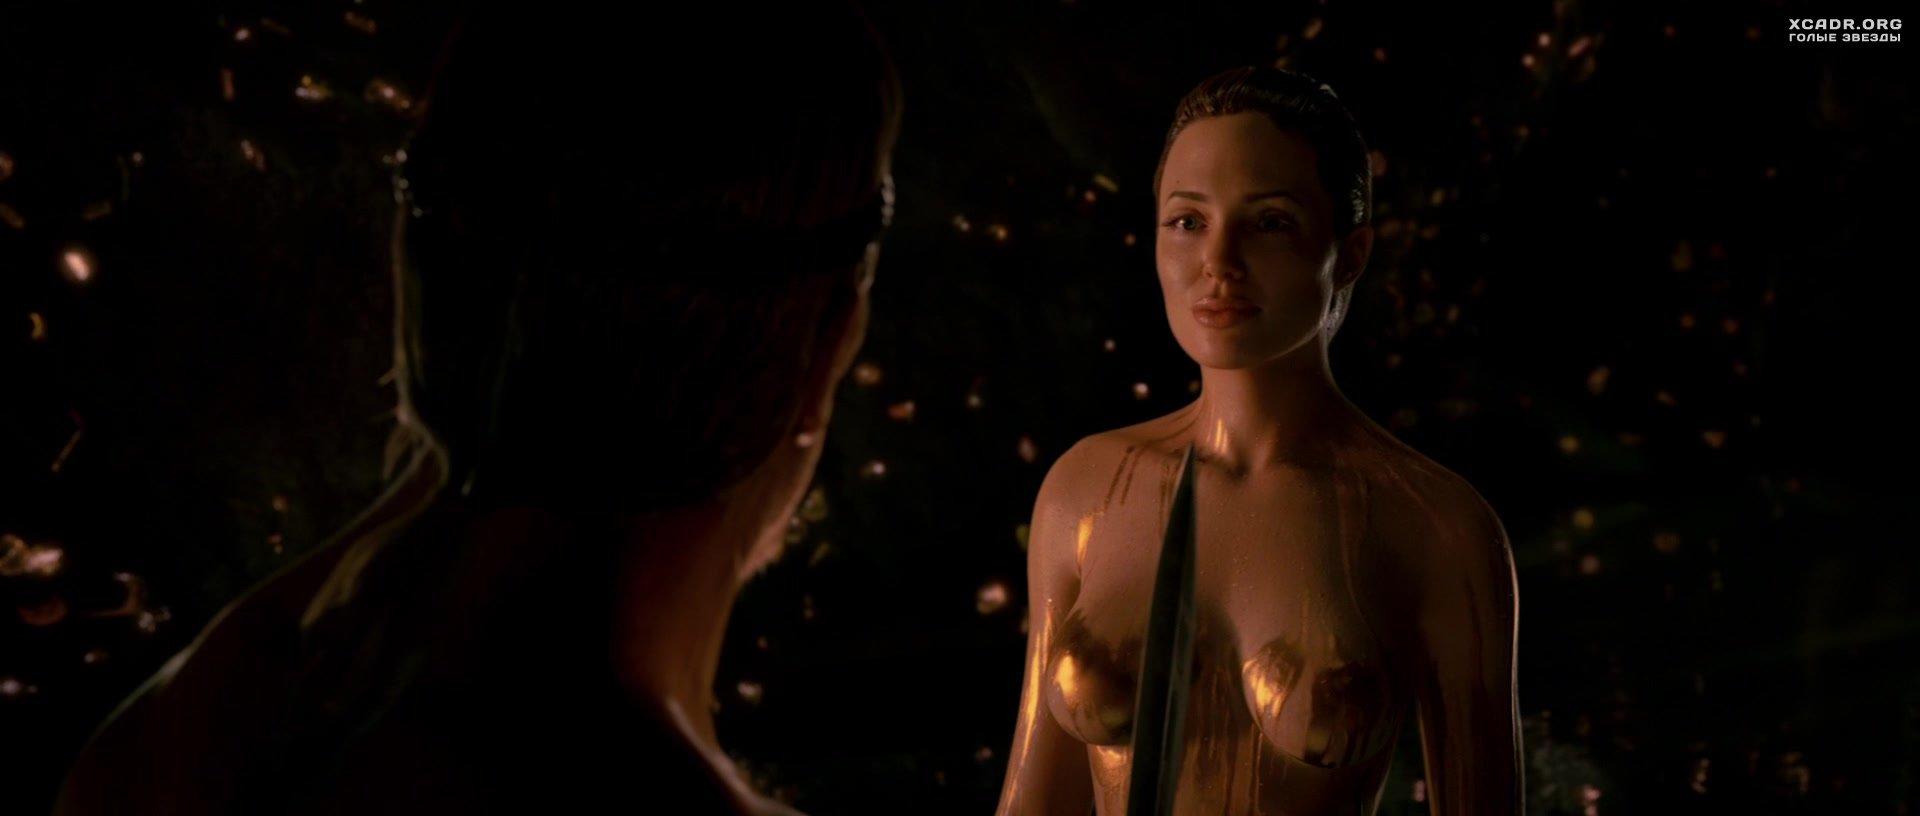 Angelina jolie nude elizabeth mitchell nude in gia